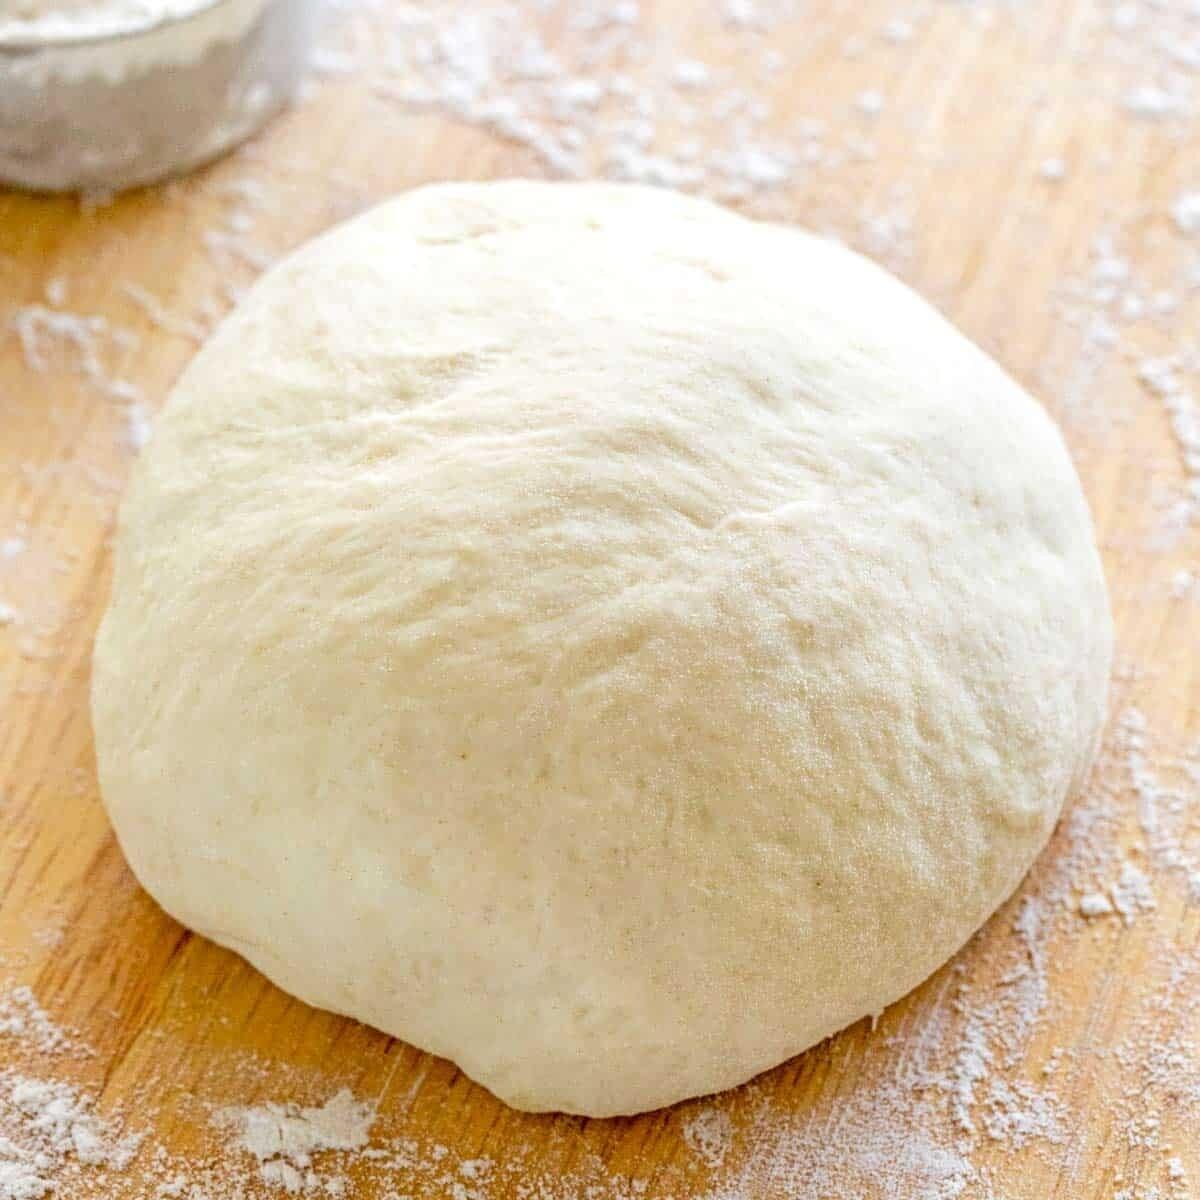 Pizza Dough Organic Grainharvest - 400g Local